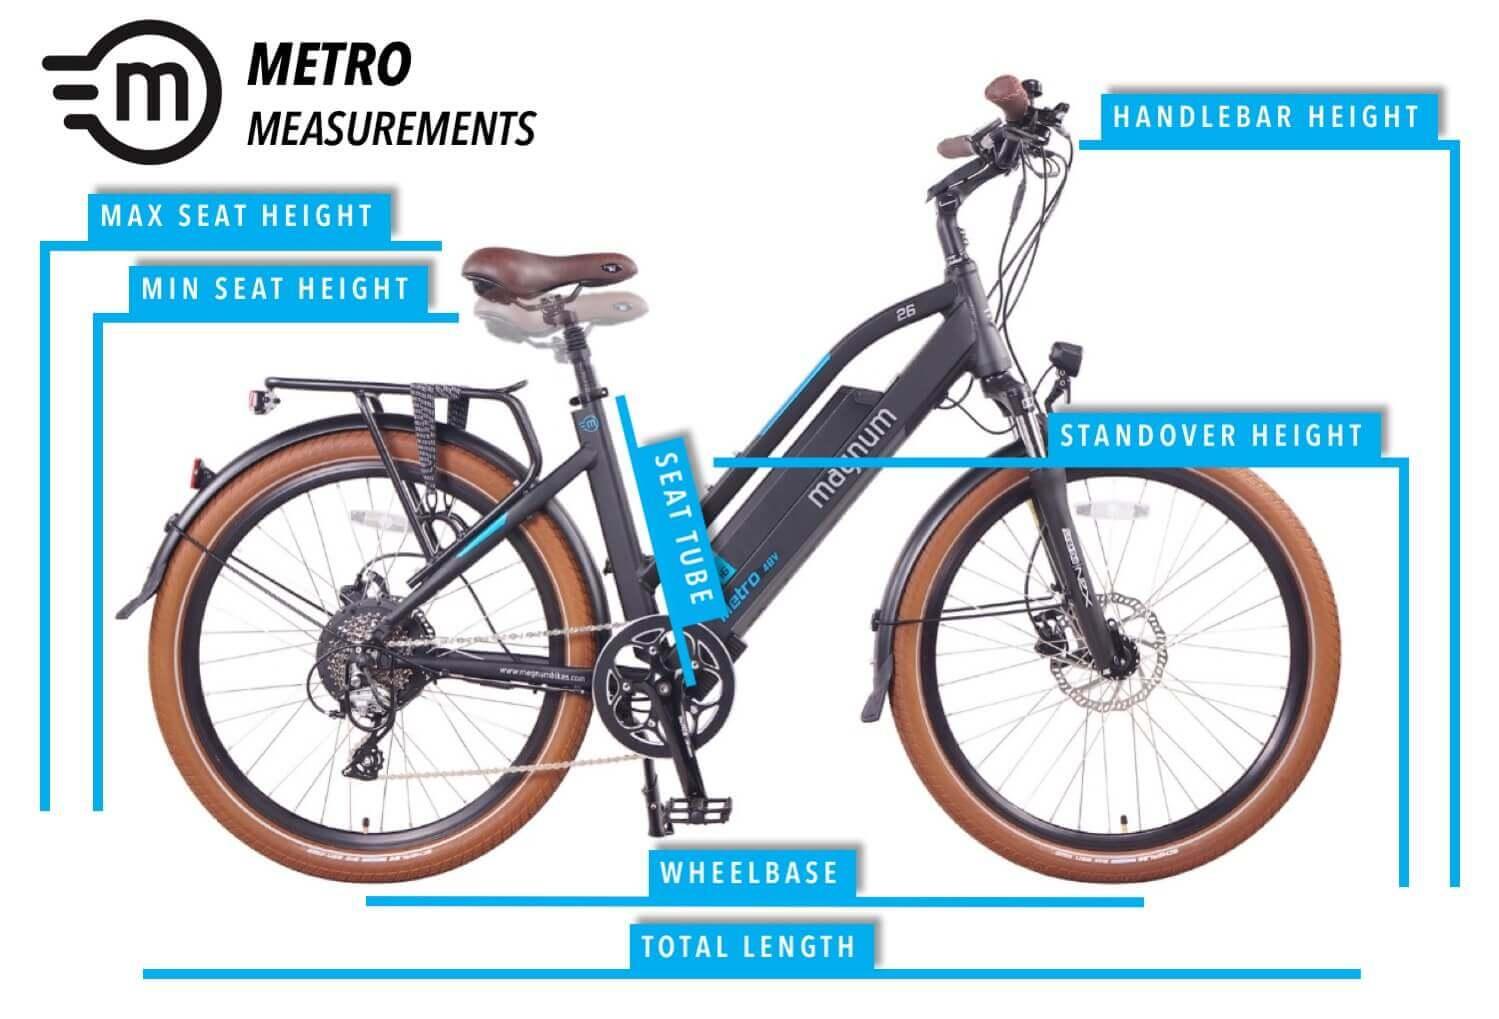 magnum-metro-measurements.2.jpg